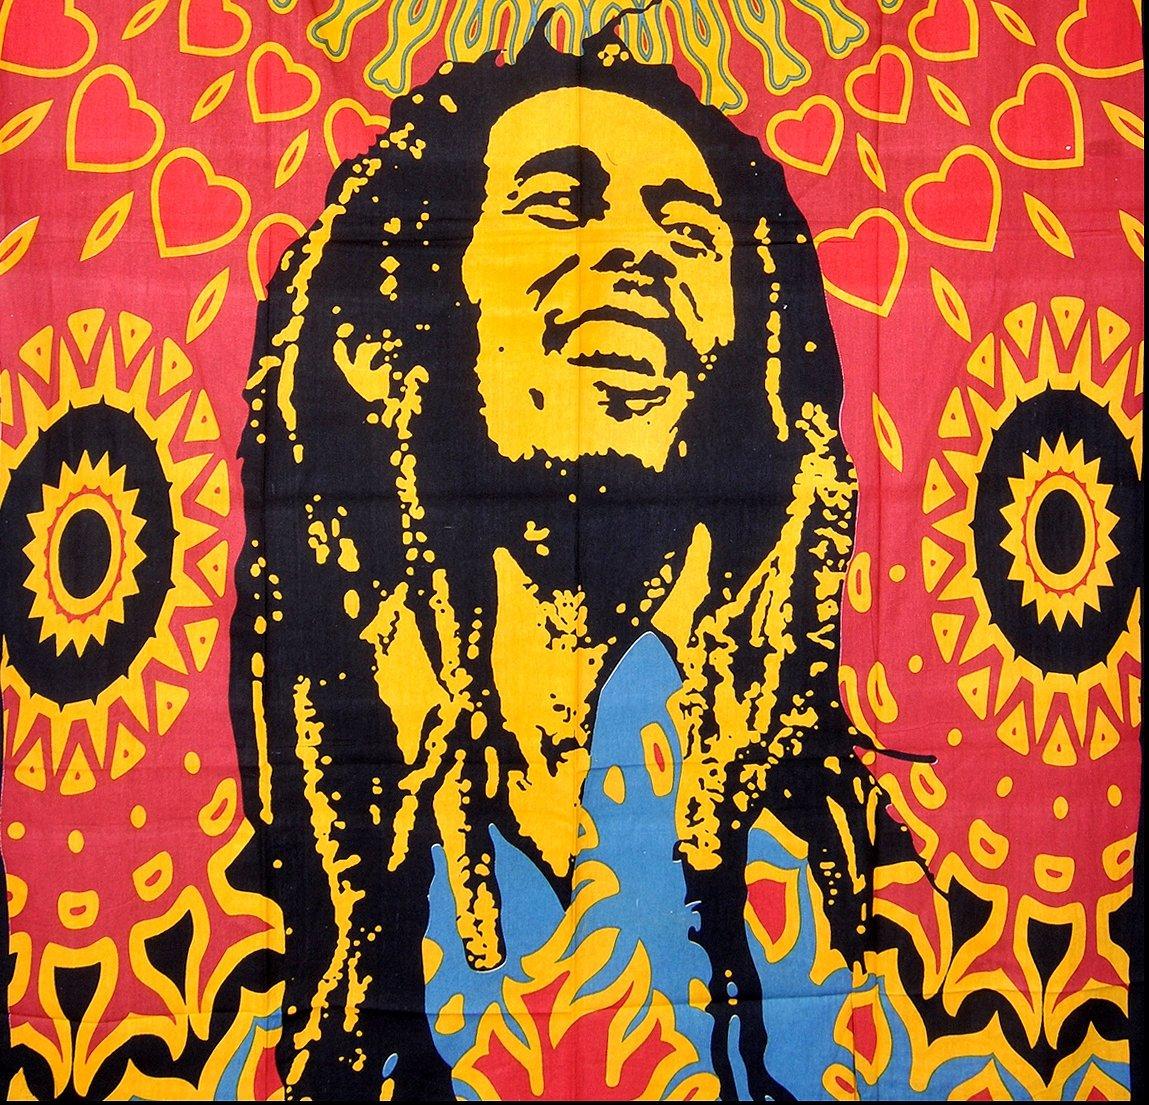 Amazon.com: ModTradIndia-Bob Marley Tapestry, Indian Hippie Wall ...